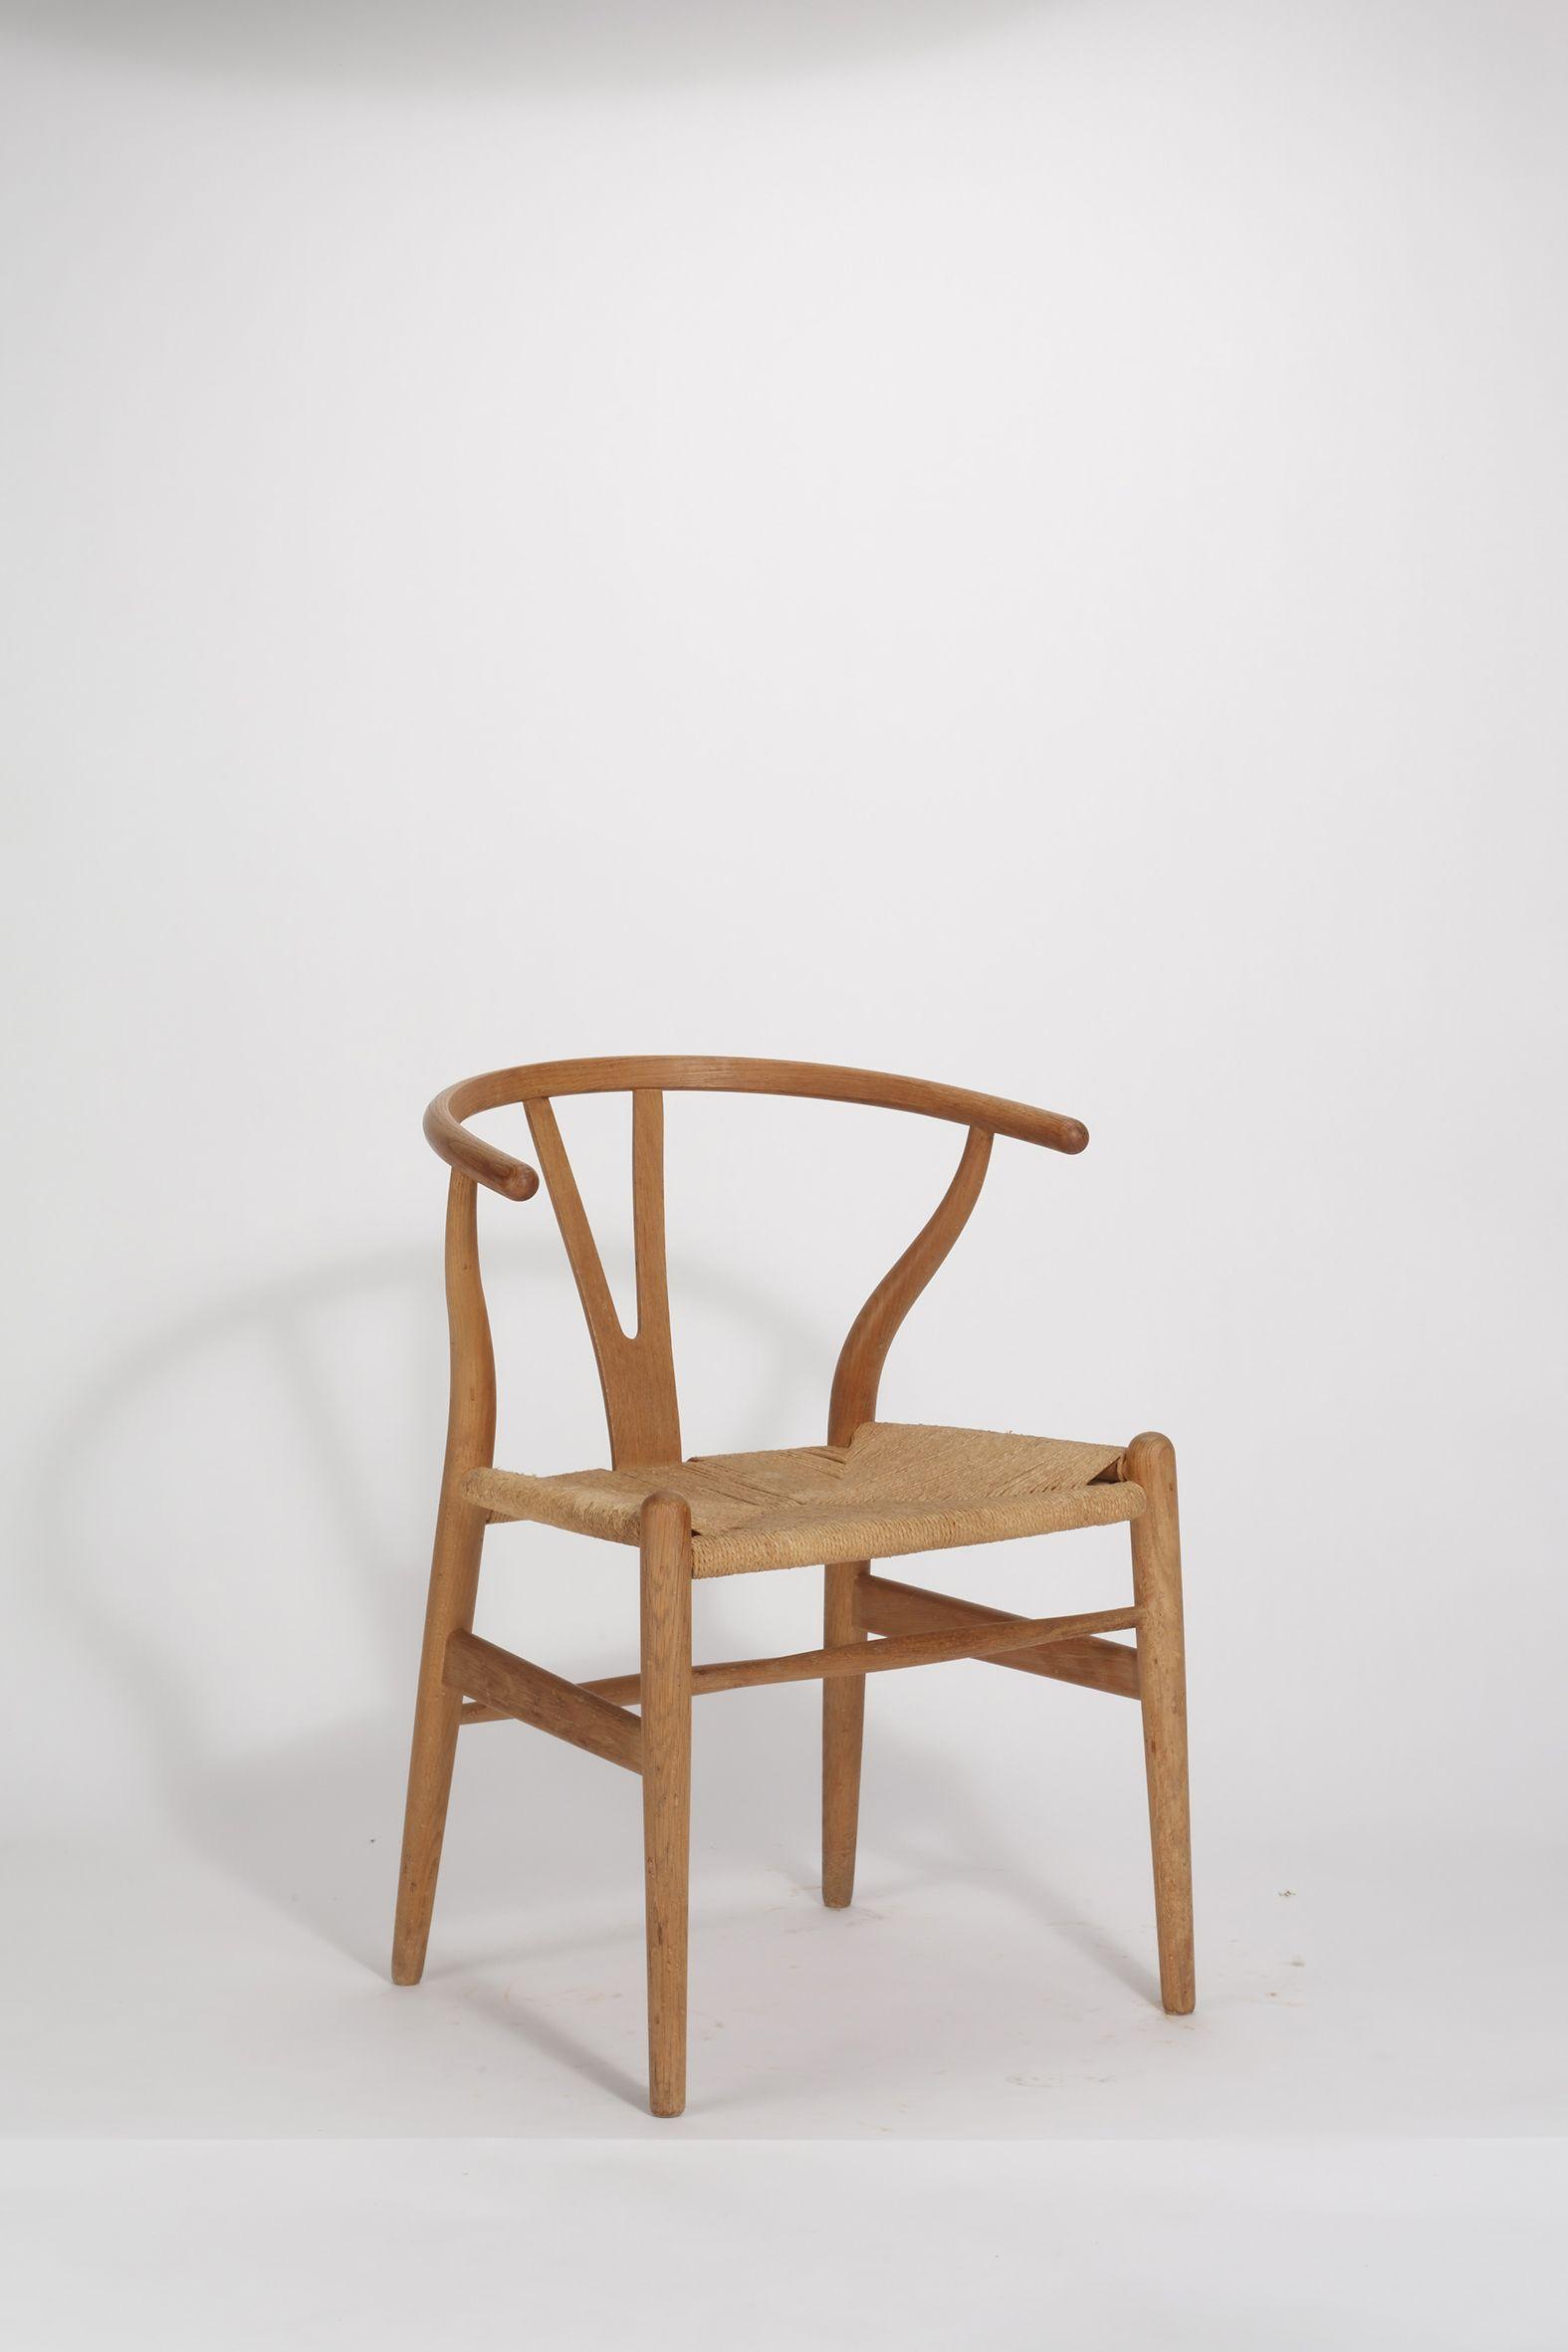 Hans j wenger y wishbone chair nr 24 1950